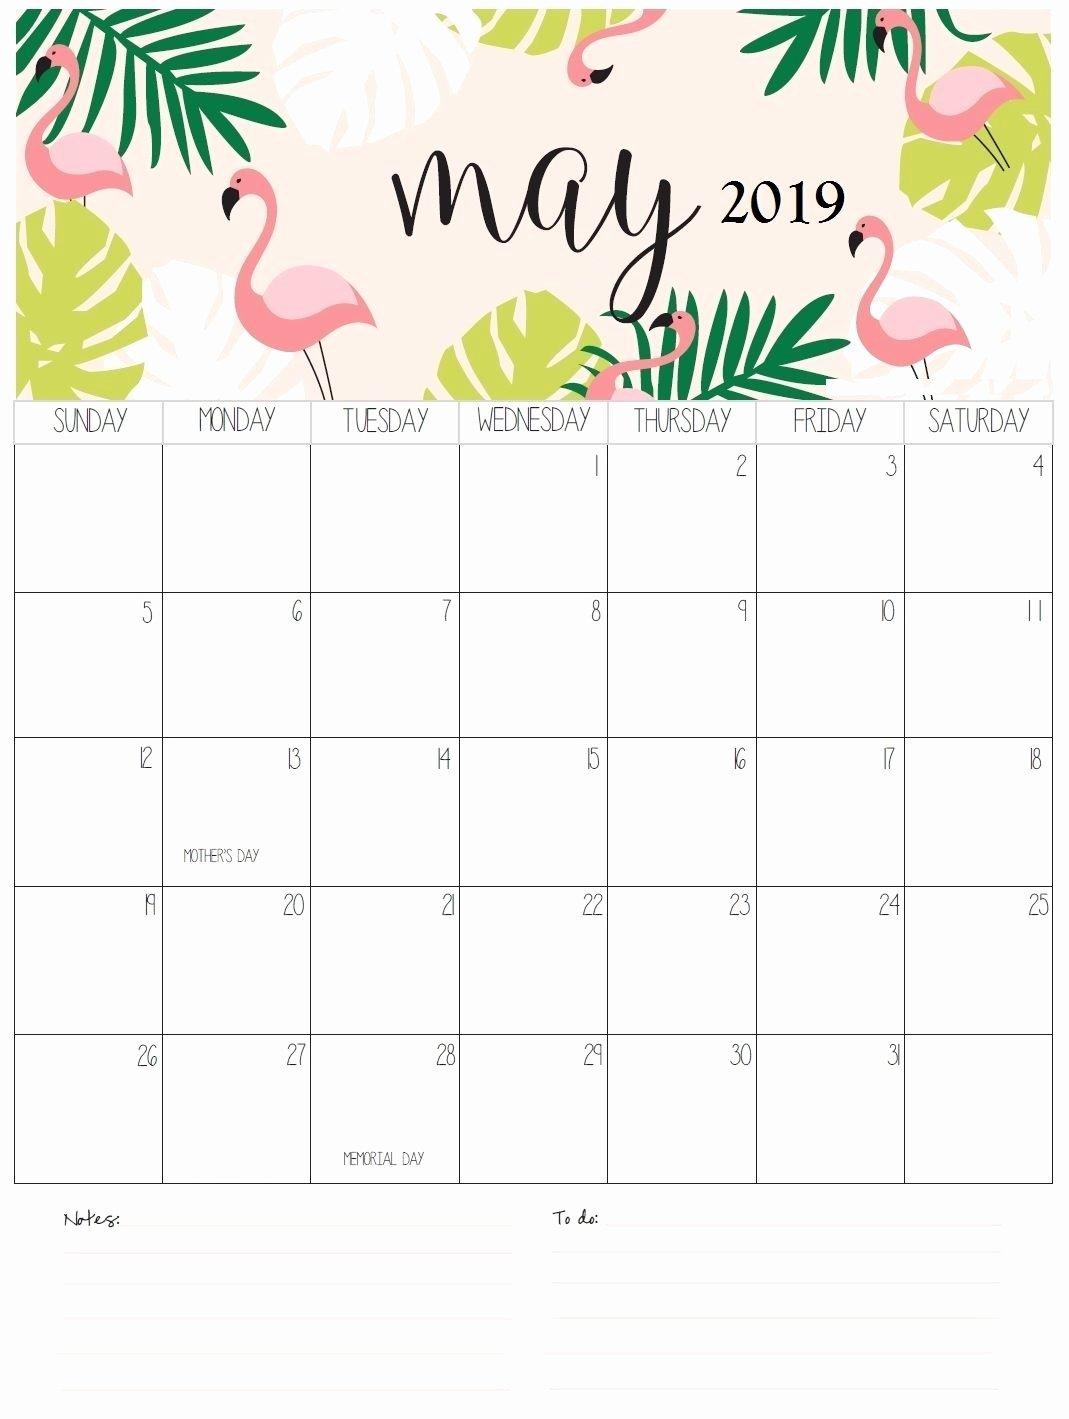 Cute Calendar Template 2019 Fresh May 2019 Calendar Printable Template with Holidays